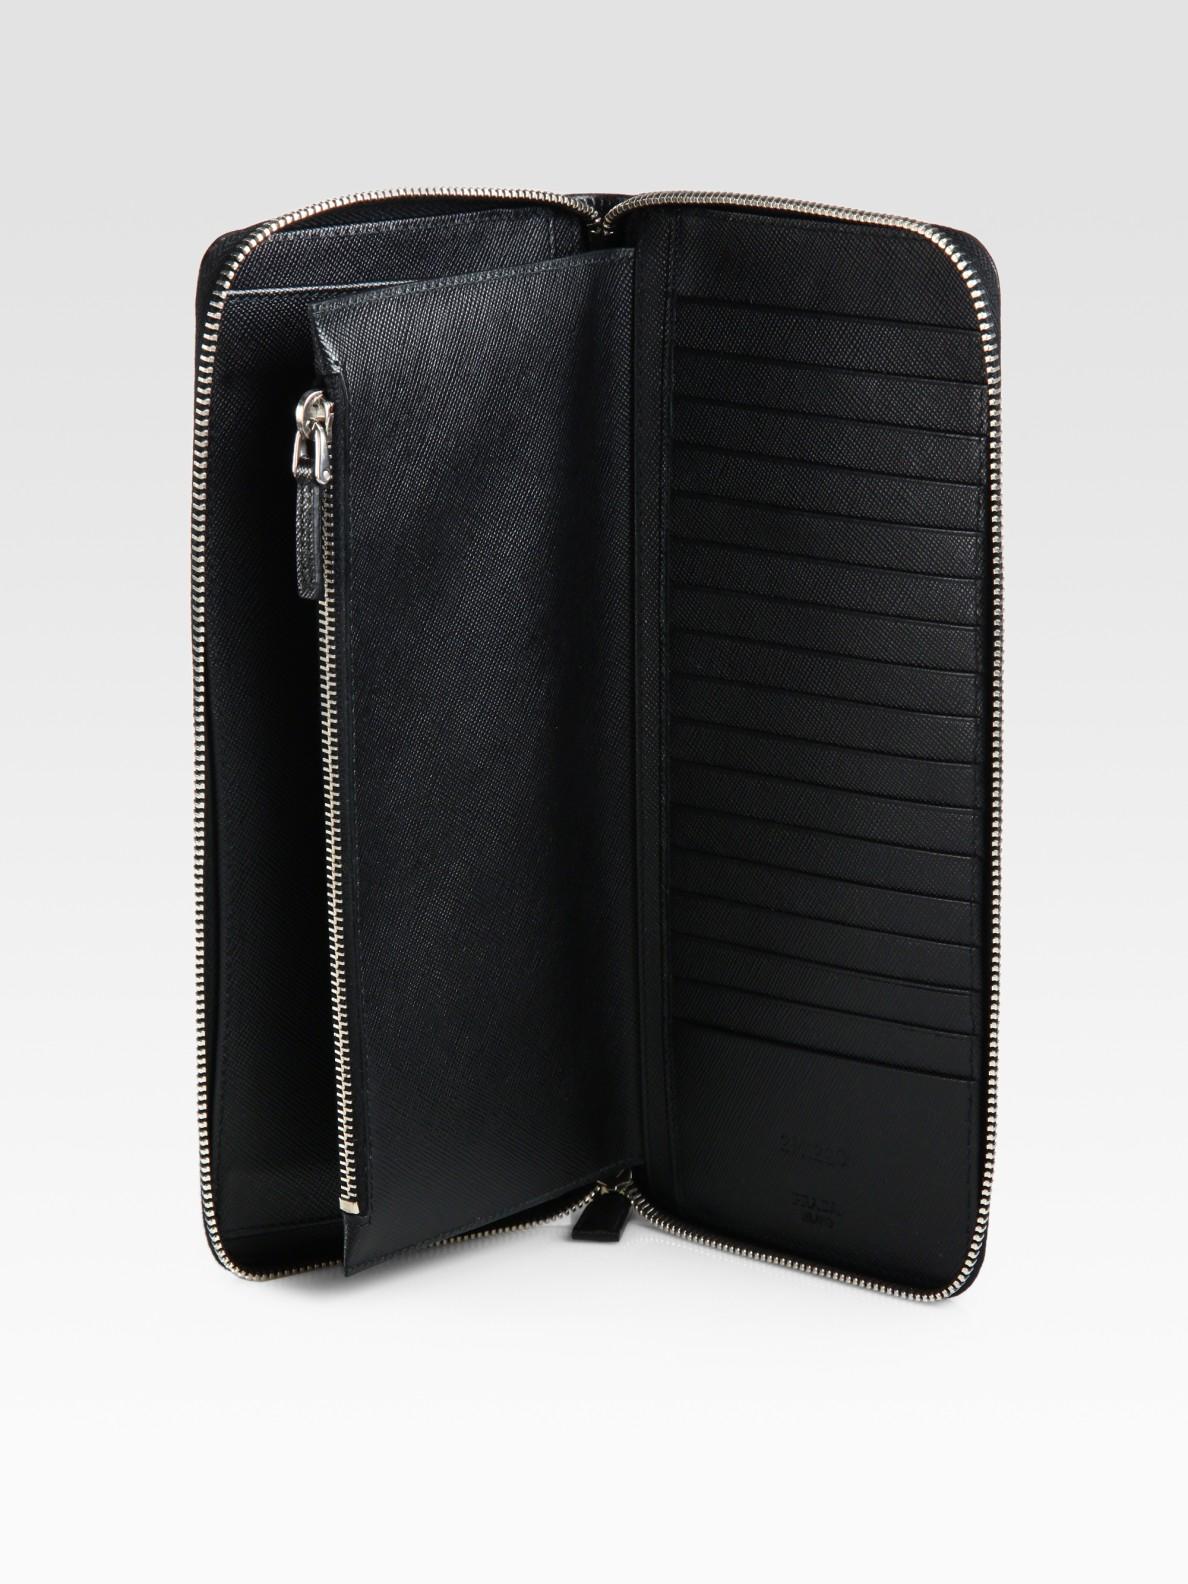 Lyst prada leather document holder in black for men for Prada mens document holder